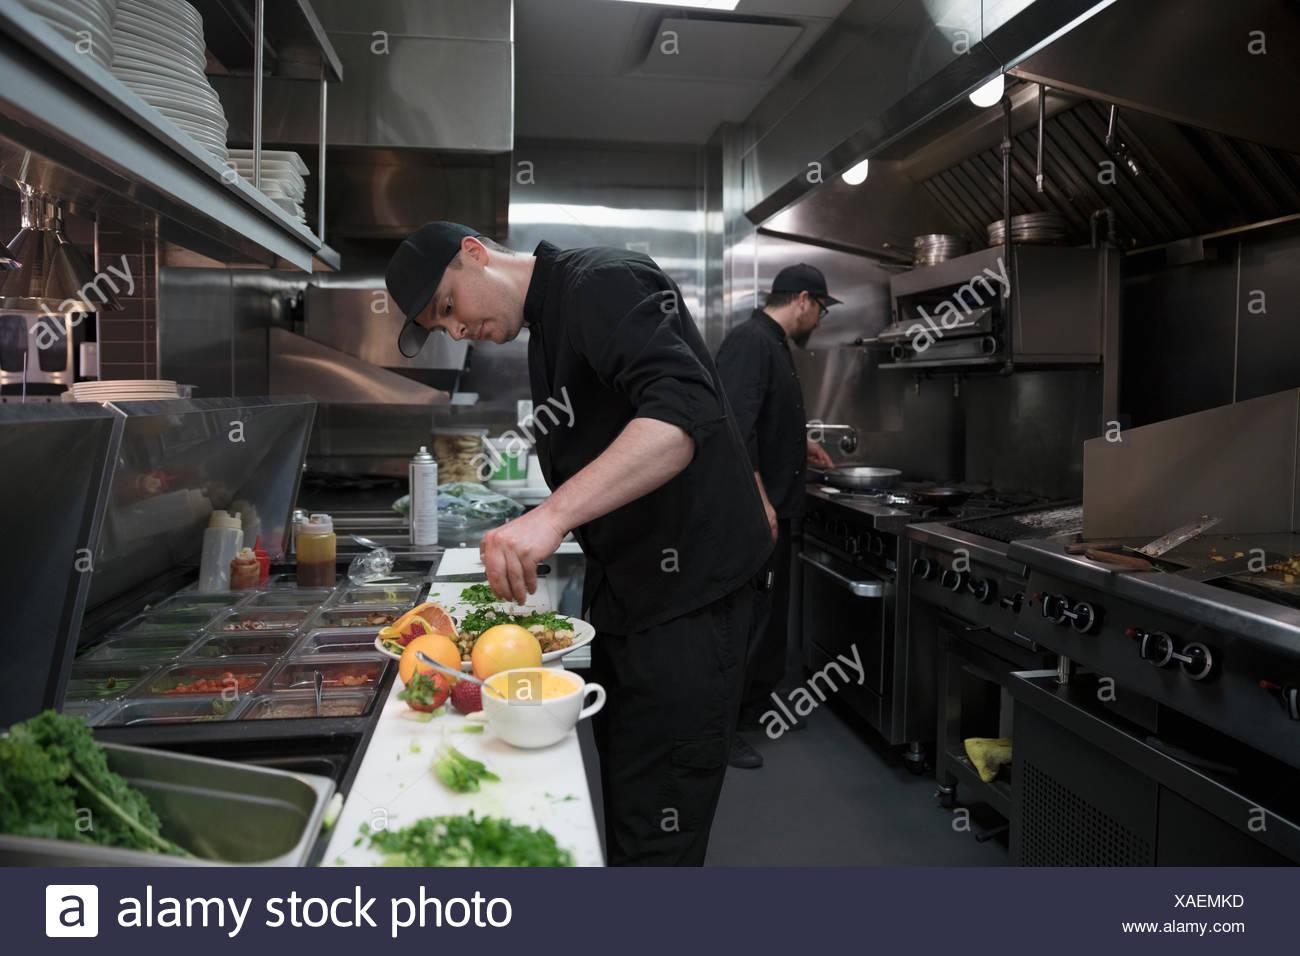 Line cook preparing food in restaurant kitchen - Stock Image